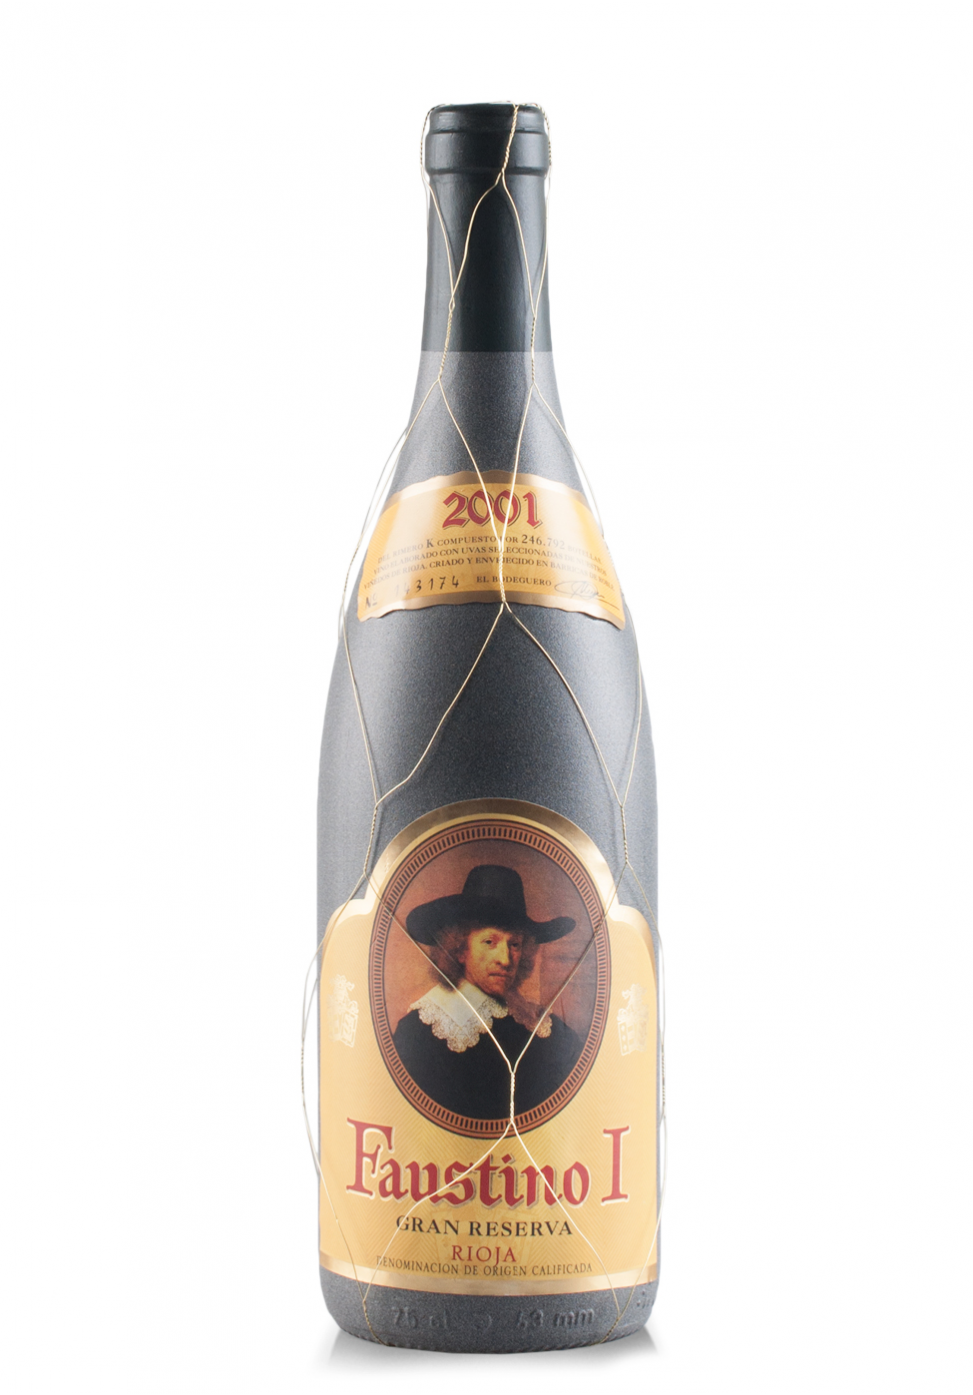 Vin Bodegas Faustino I Gran Reserva 2001, DOC Rioja (0.75L)